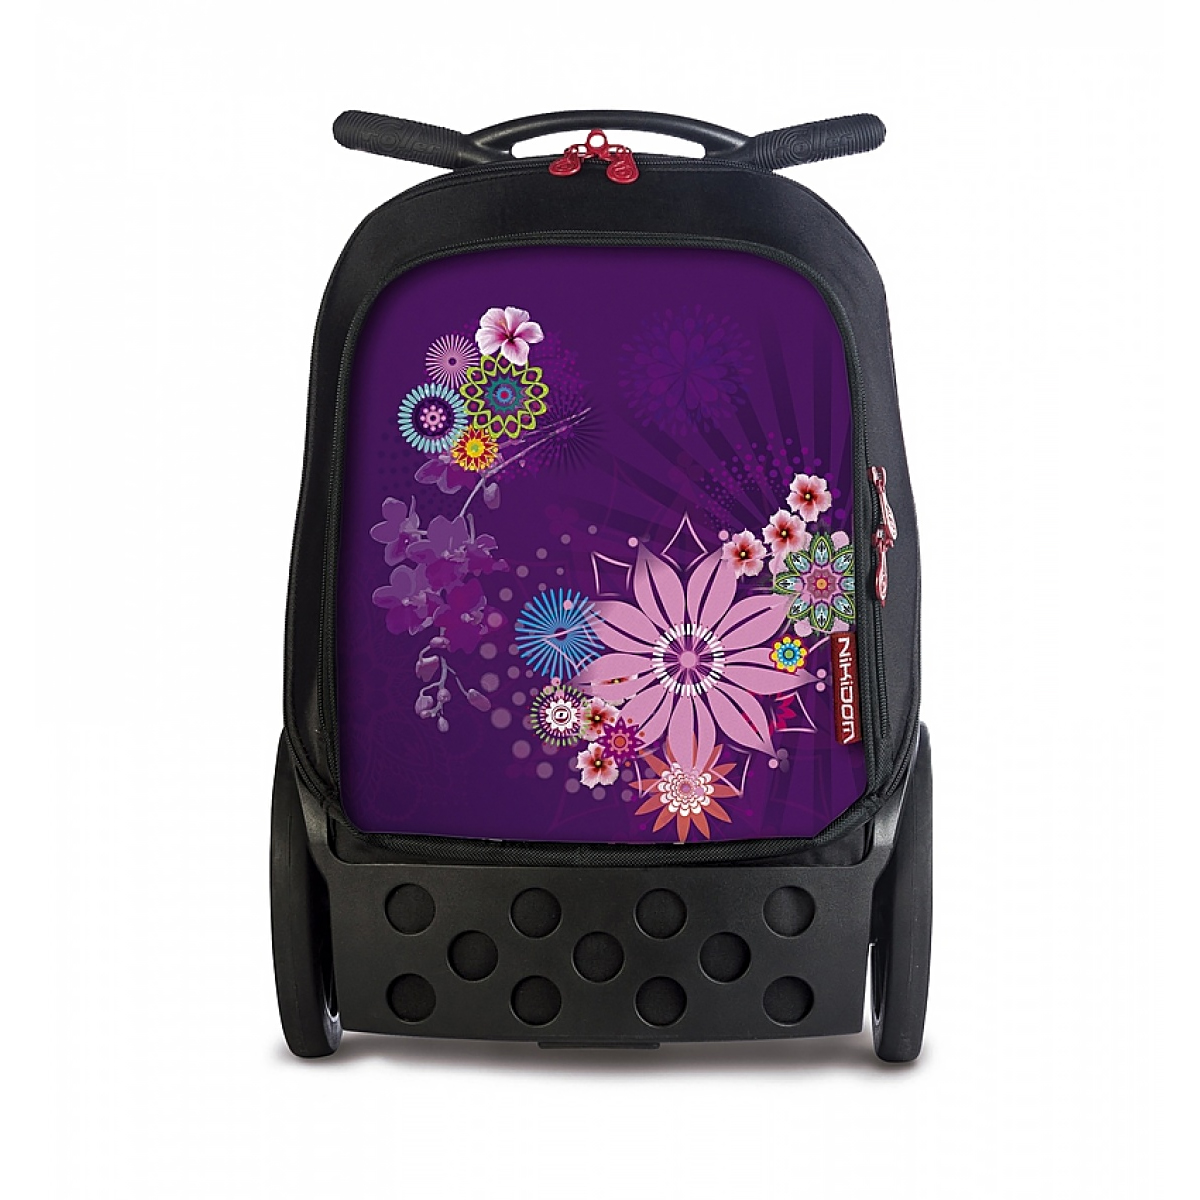 Ghiozdan Școlar, Tip Troller, Bloom, Nikidom, ND-9023